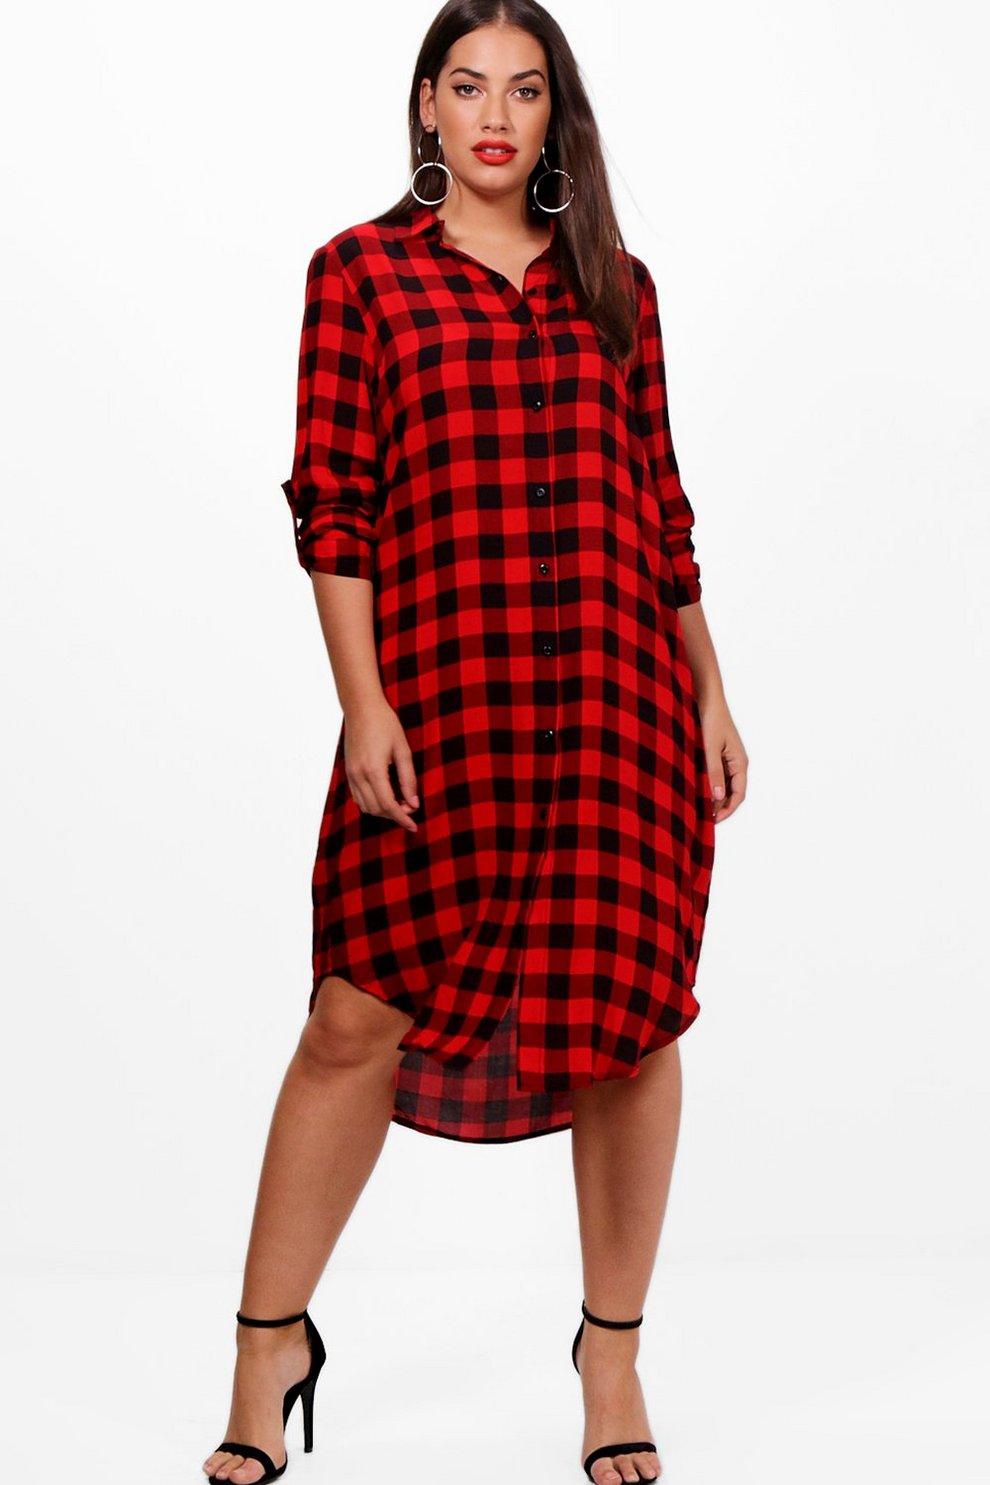 f92aa6d12e vestido estilo camisa de cuadros Maddie plus